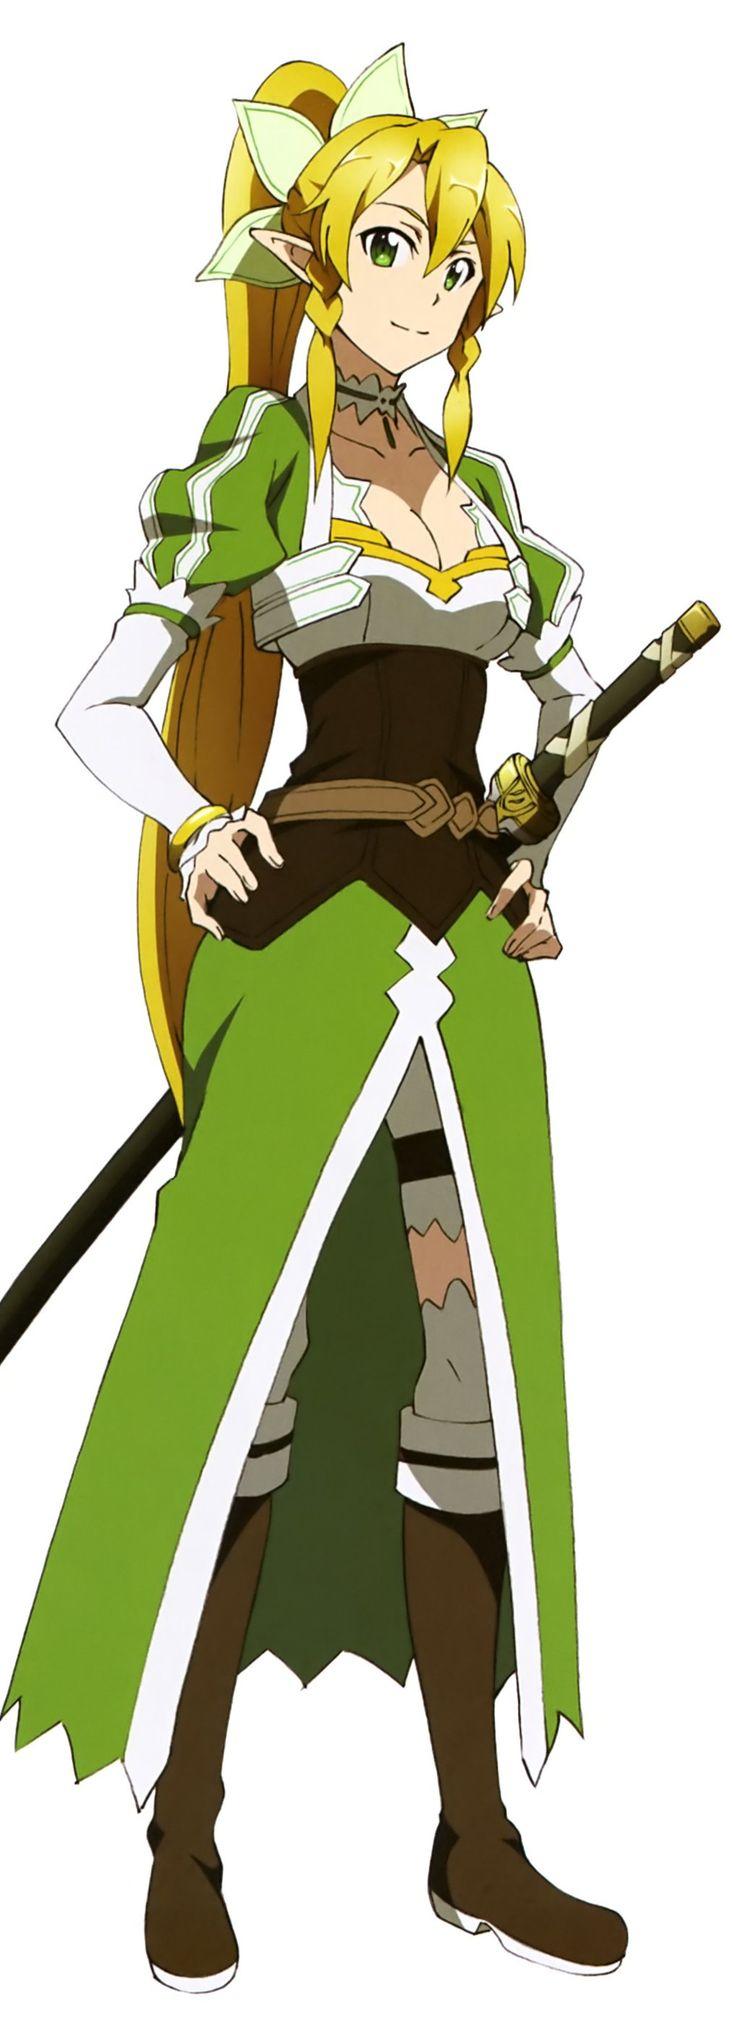 Sword Art Online, Leafa, official art